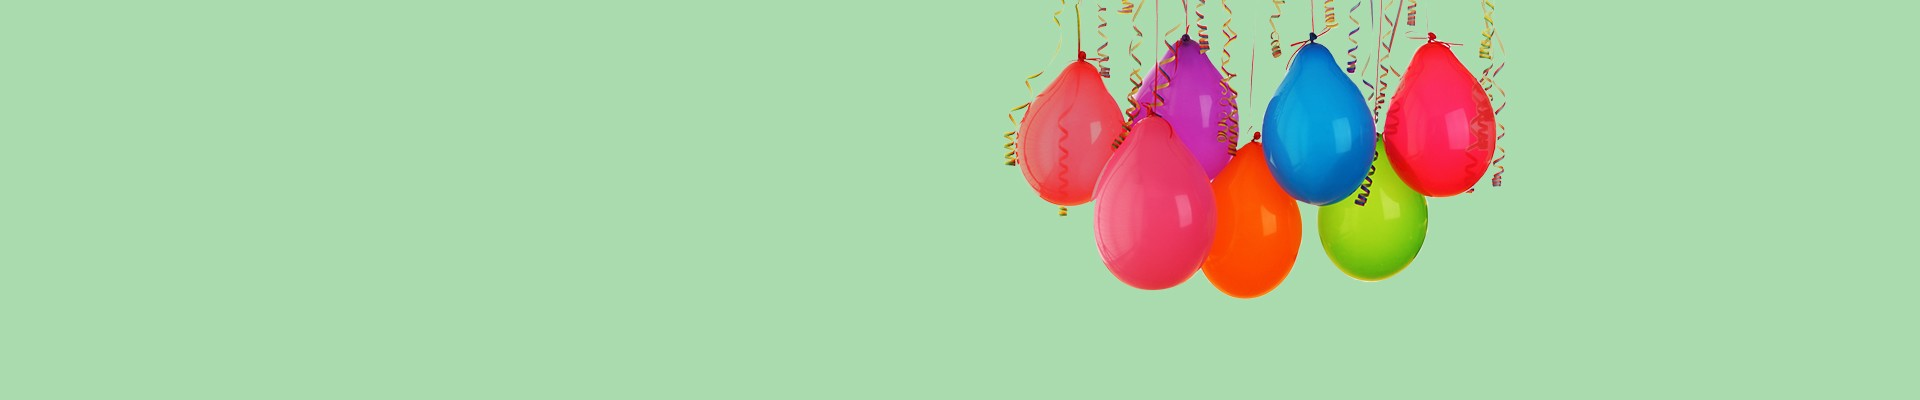 Jual Aneka Balon Terlengkap - Harga Grosir